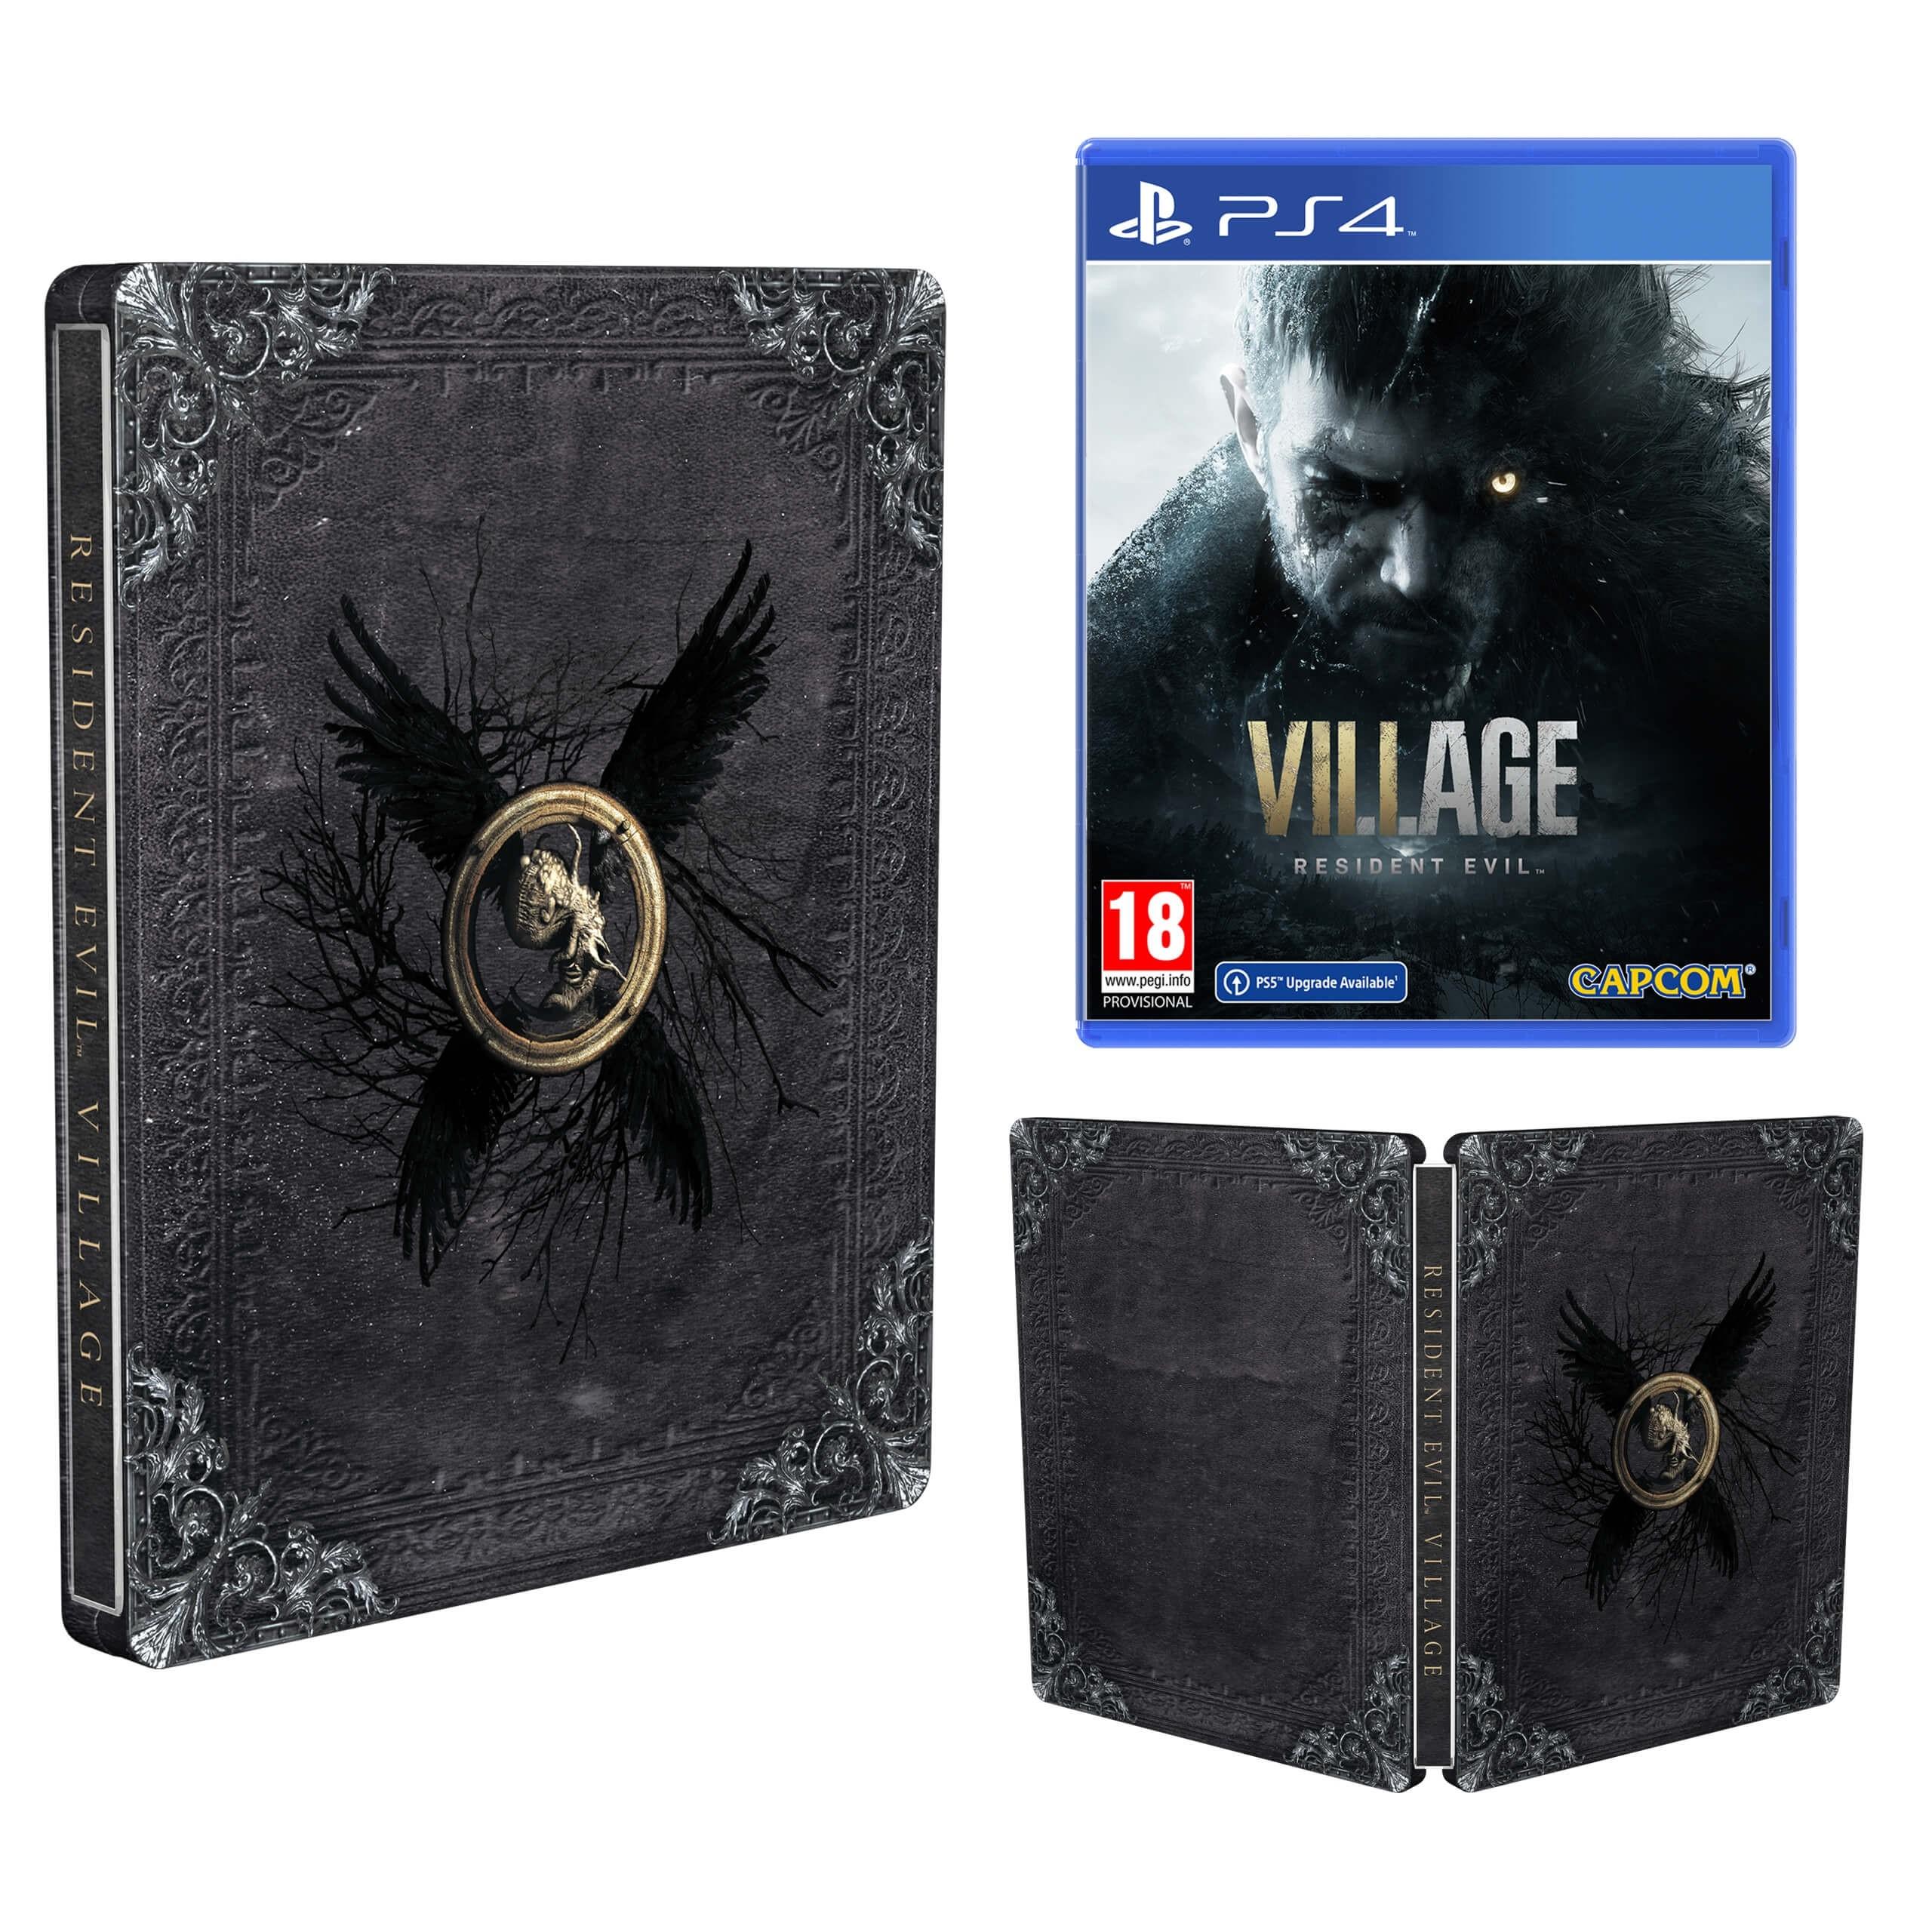 Resident Evil Village Steelbook bonus przedpremierowy